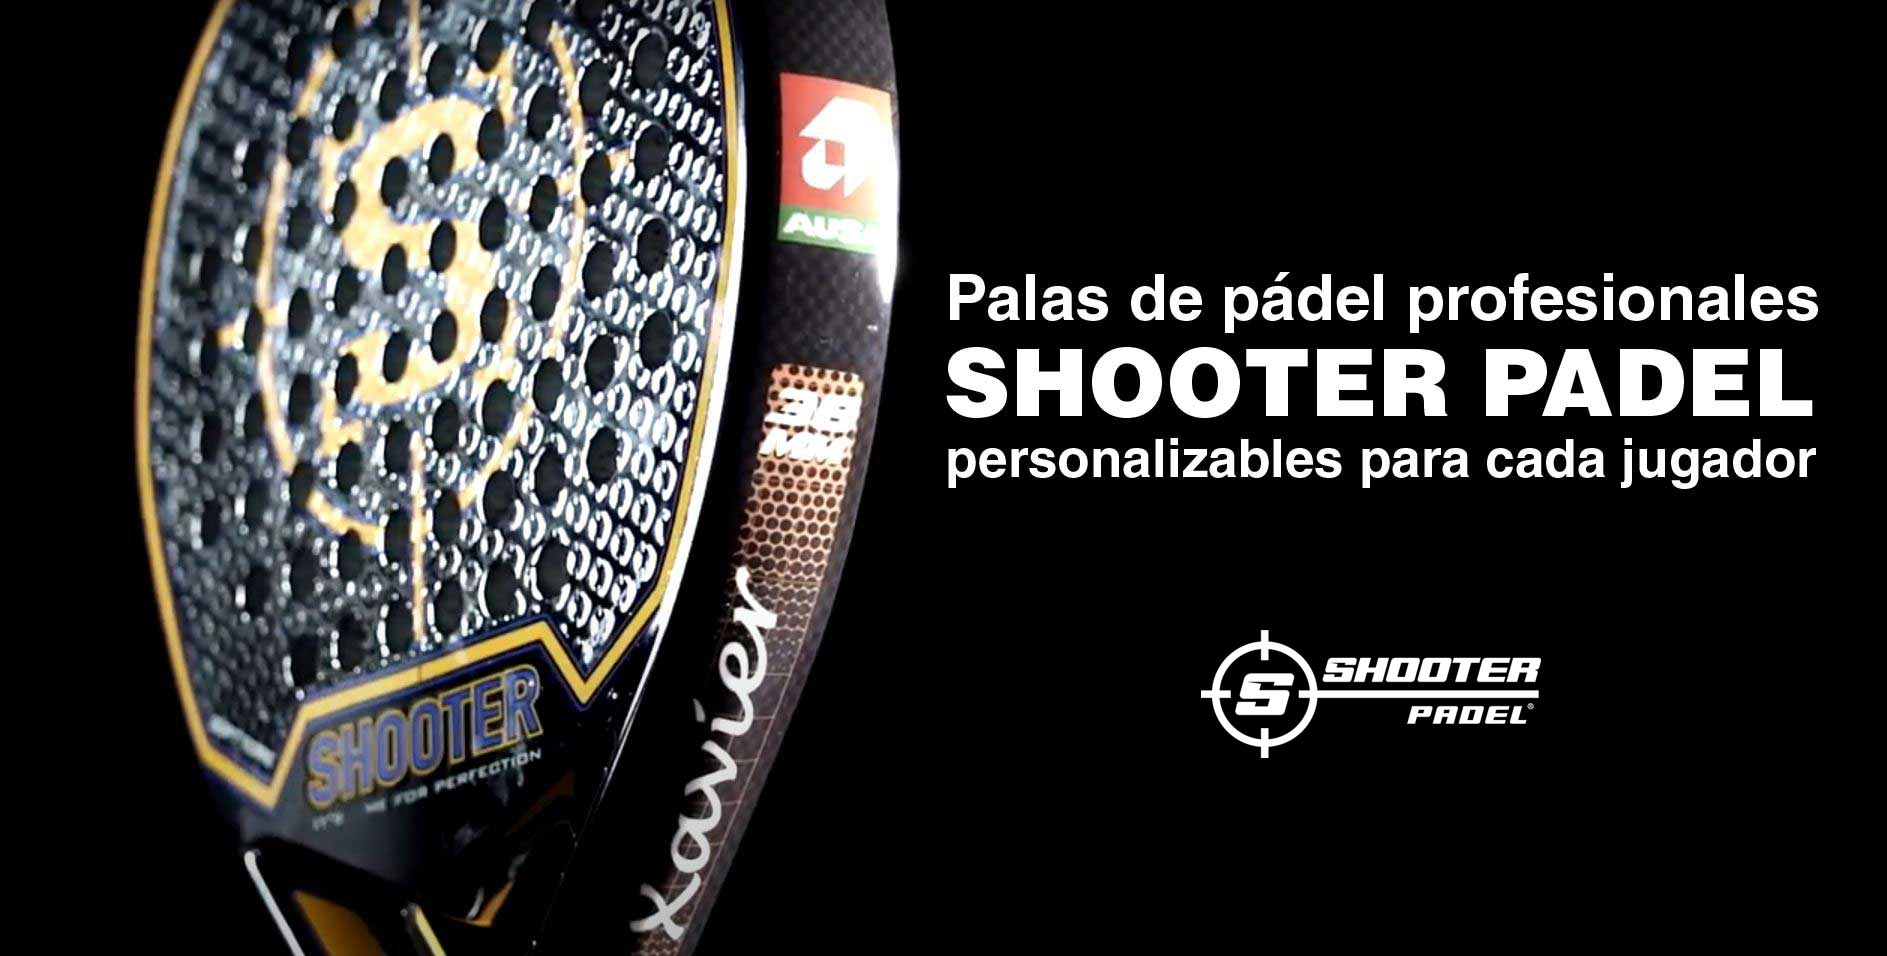 Palas de pádel personalizables con nombre SHOOTER PADEL